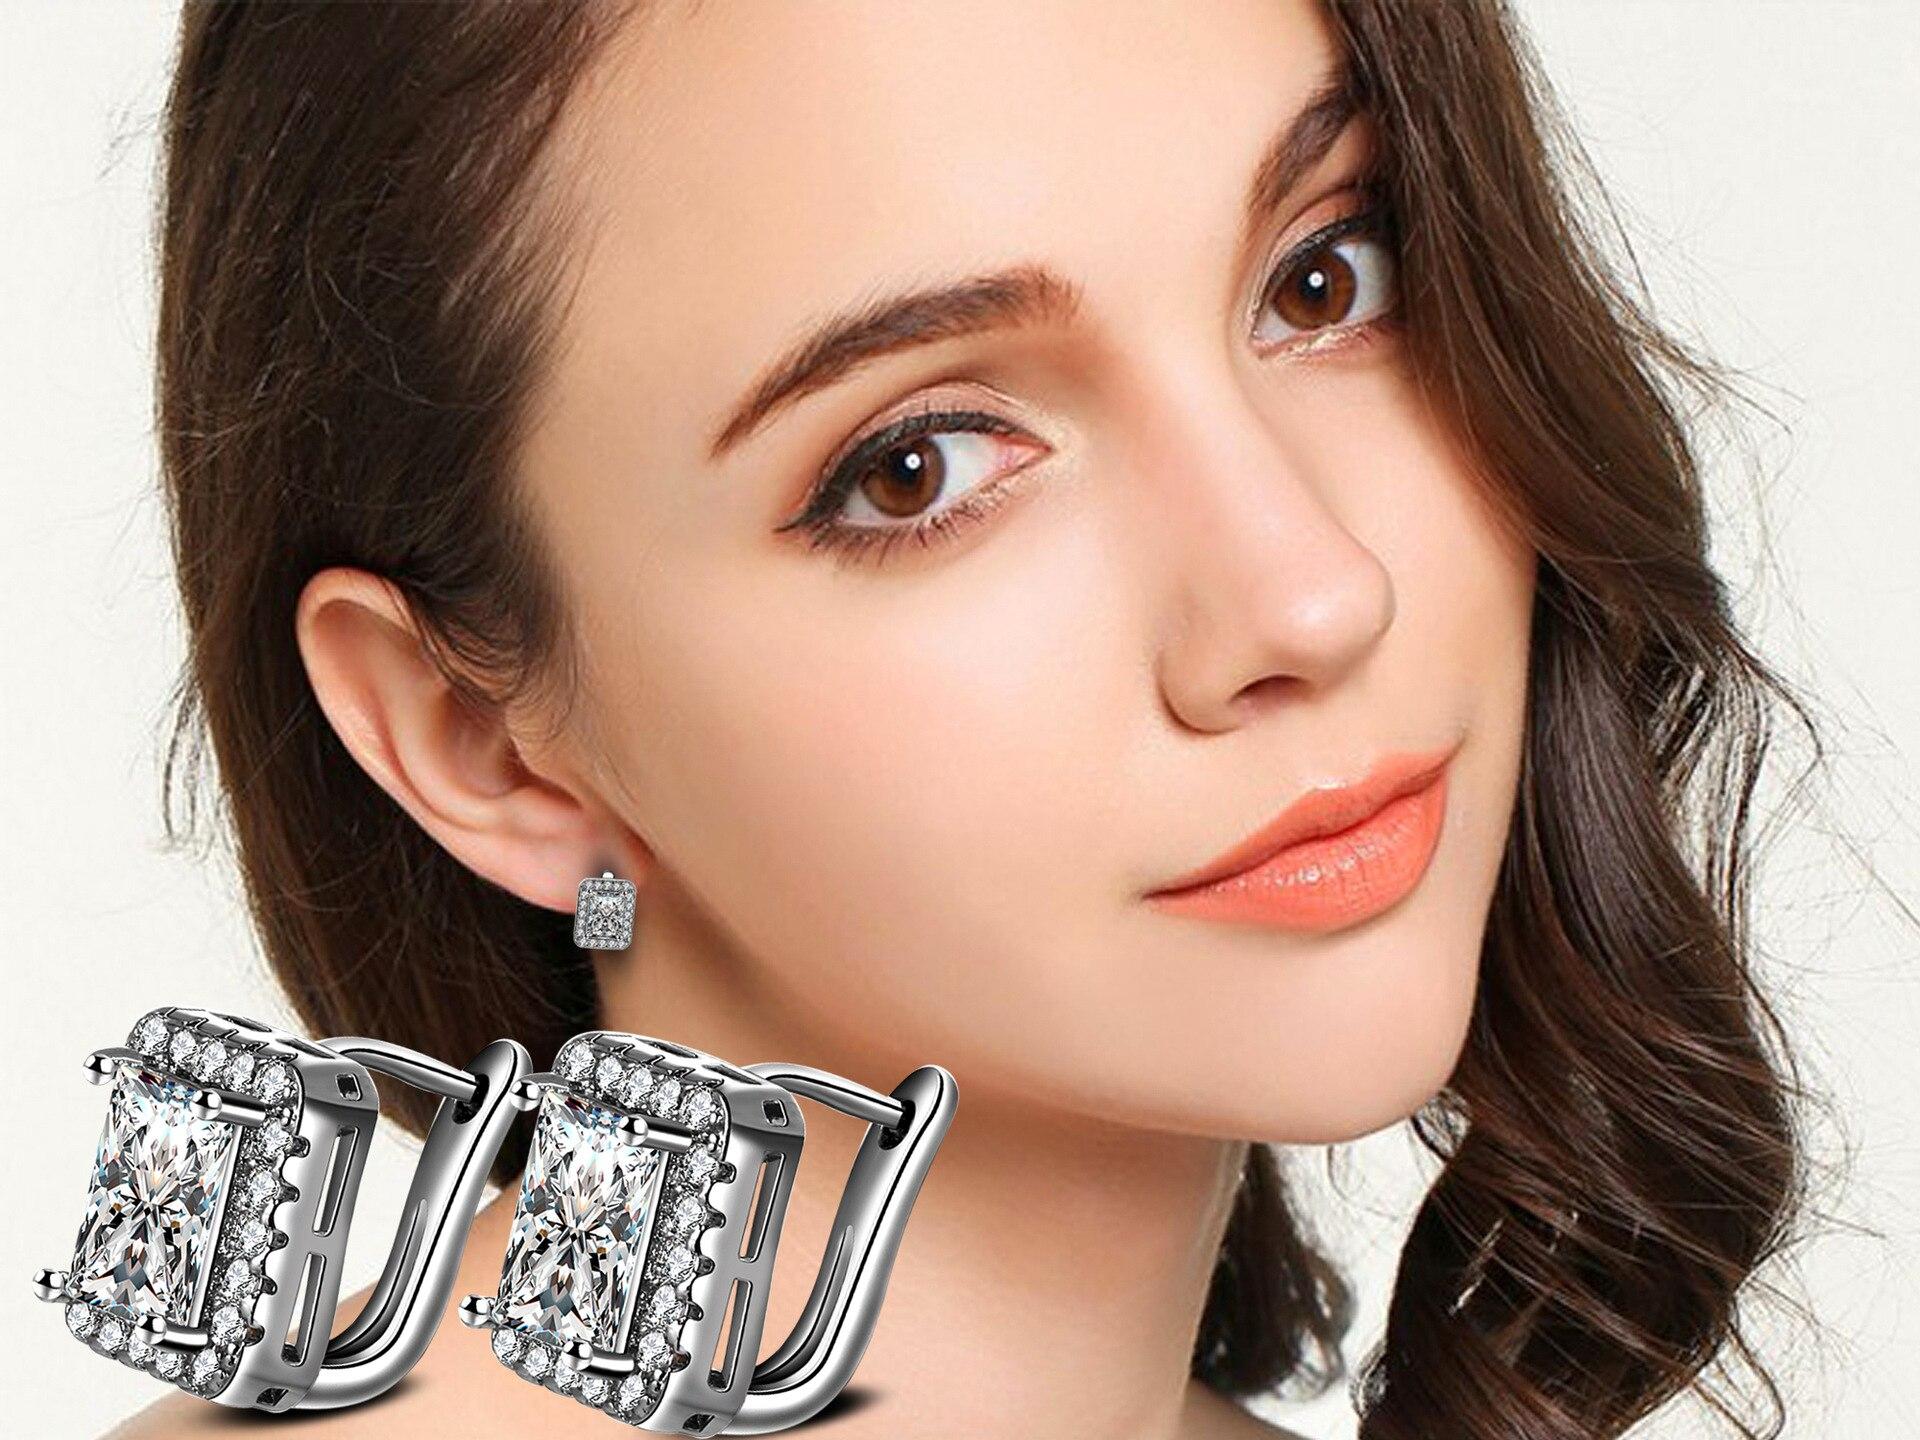 RUOYE Mode Frauen Bolzenohrrings Luxus AAA Zirkon Ohrring Quadrat - Modeschmuck - Foto 6